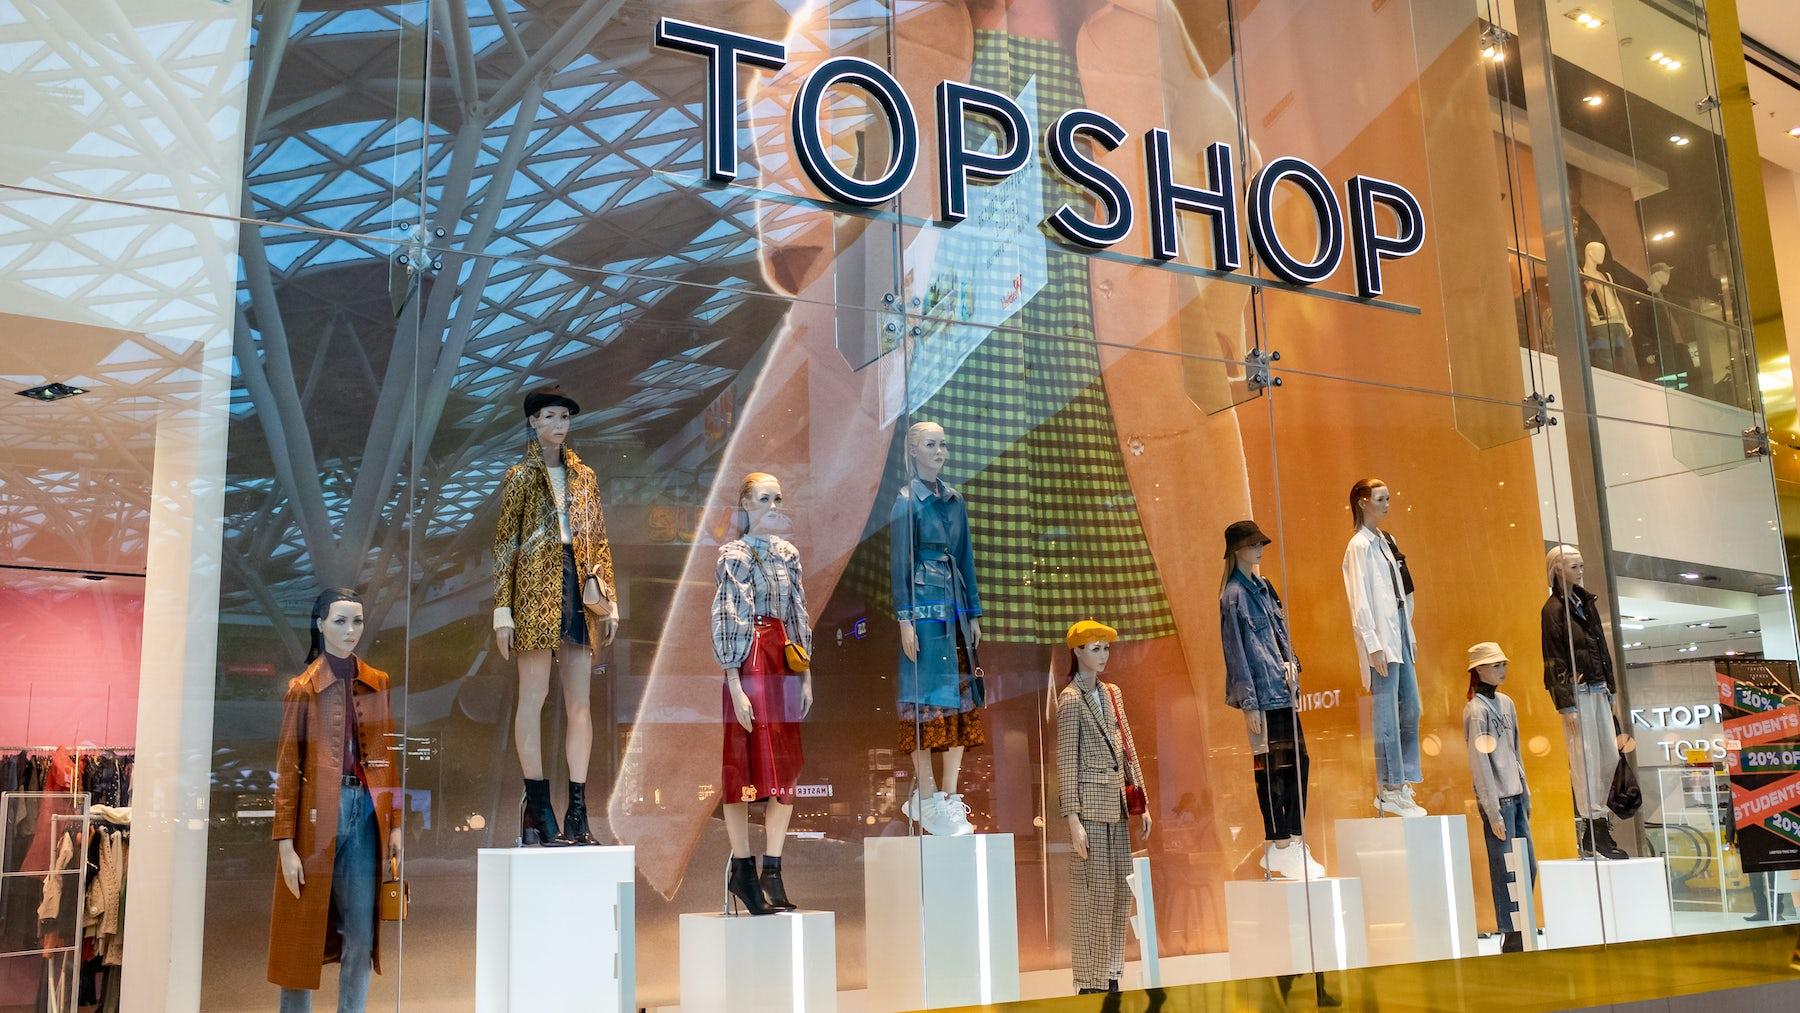 A Topshop store. Source: Shutterstock.